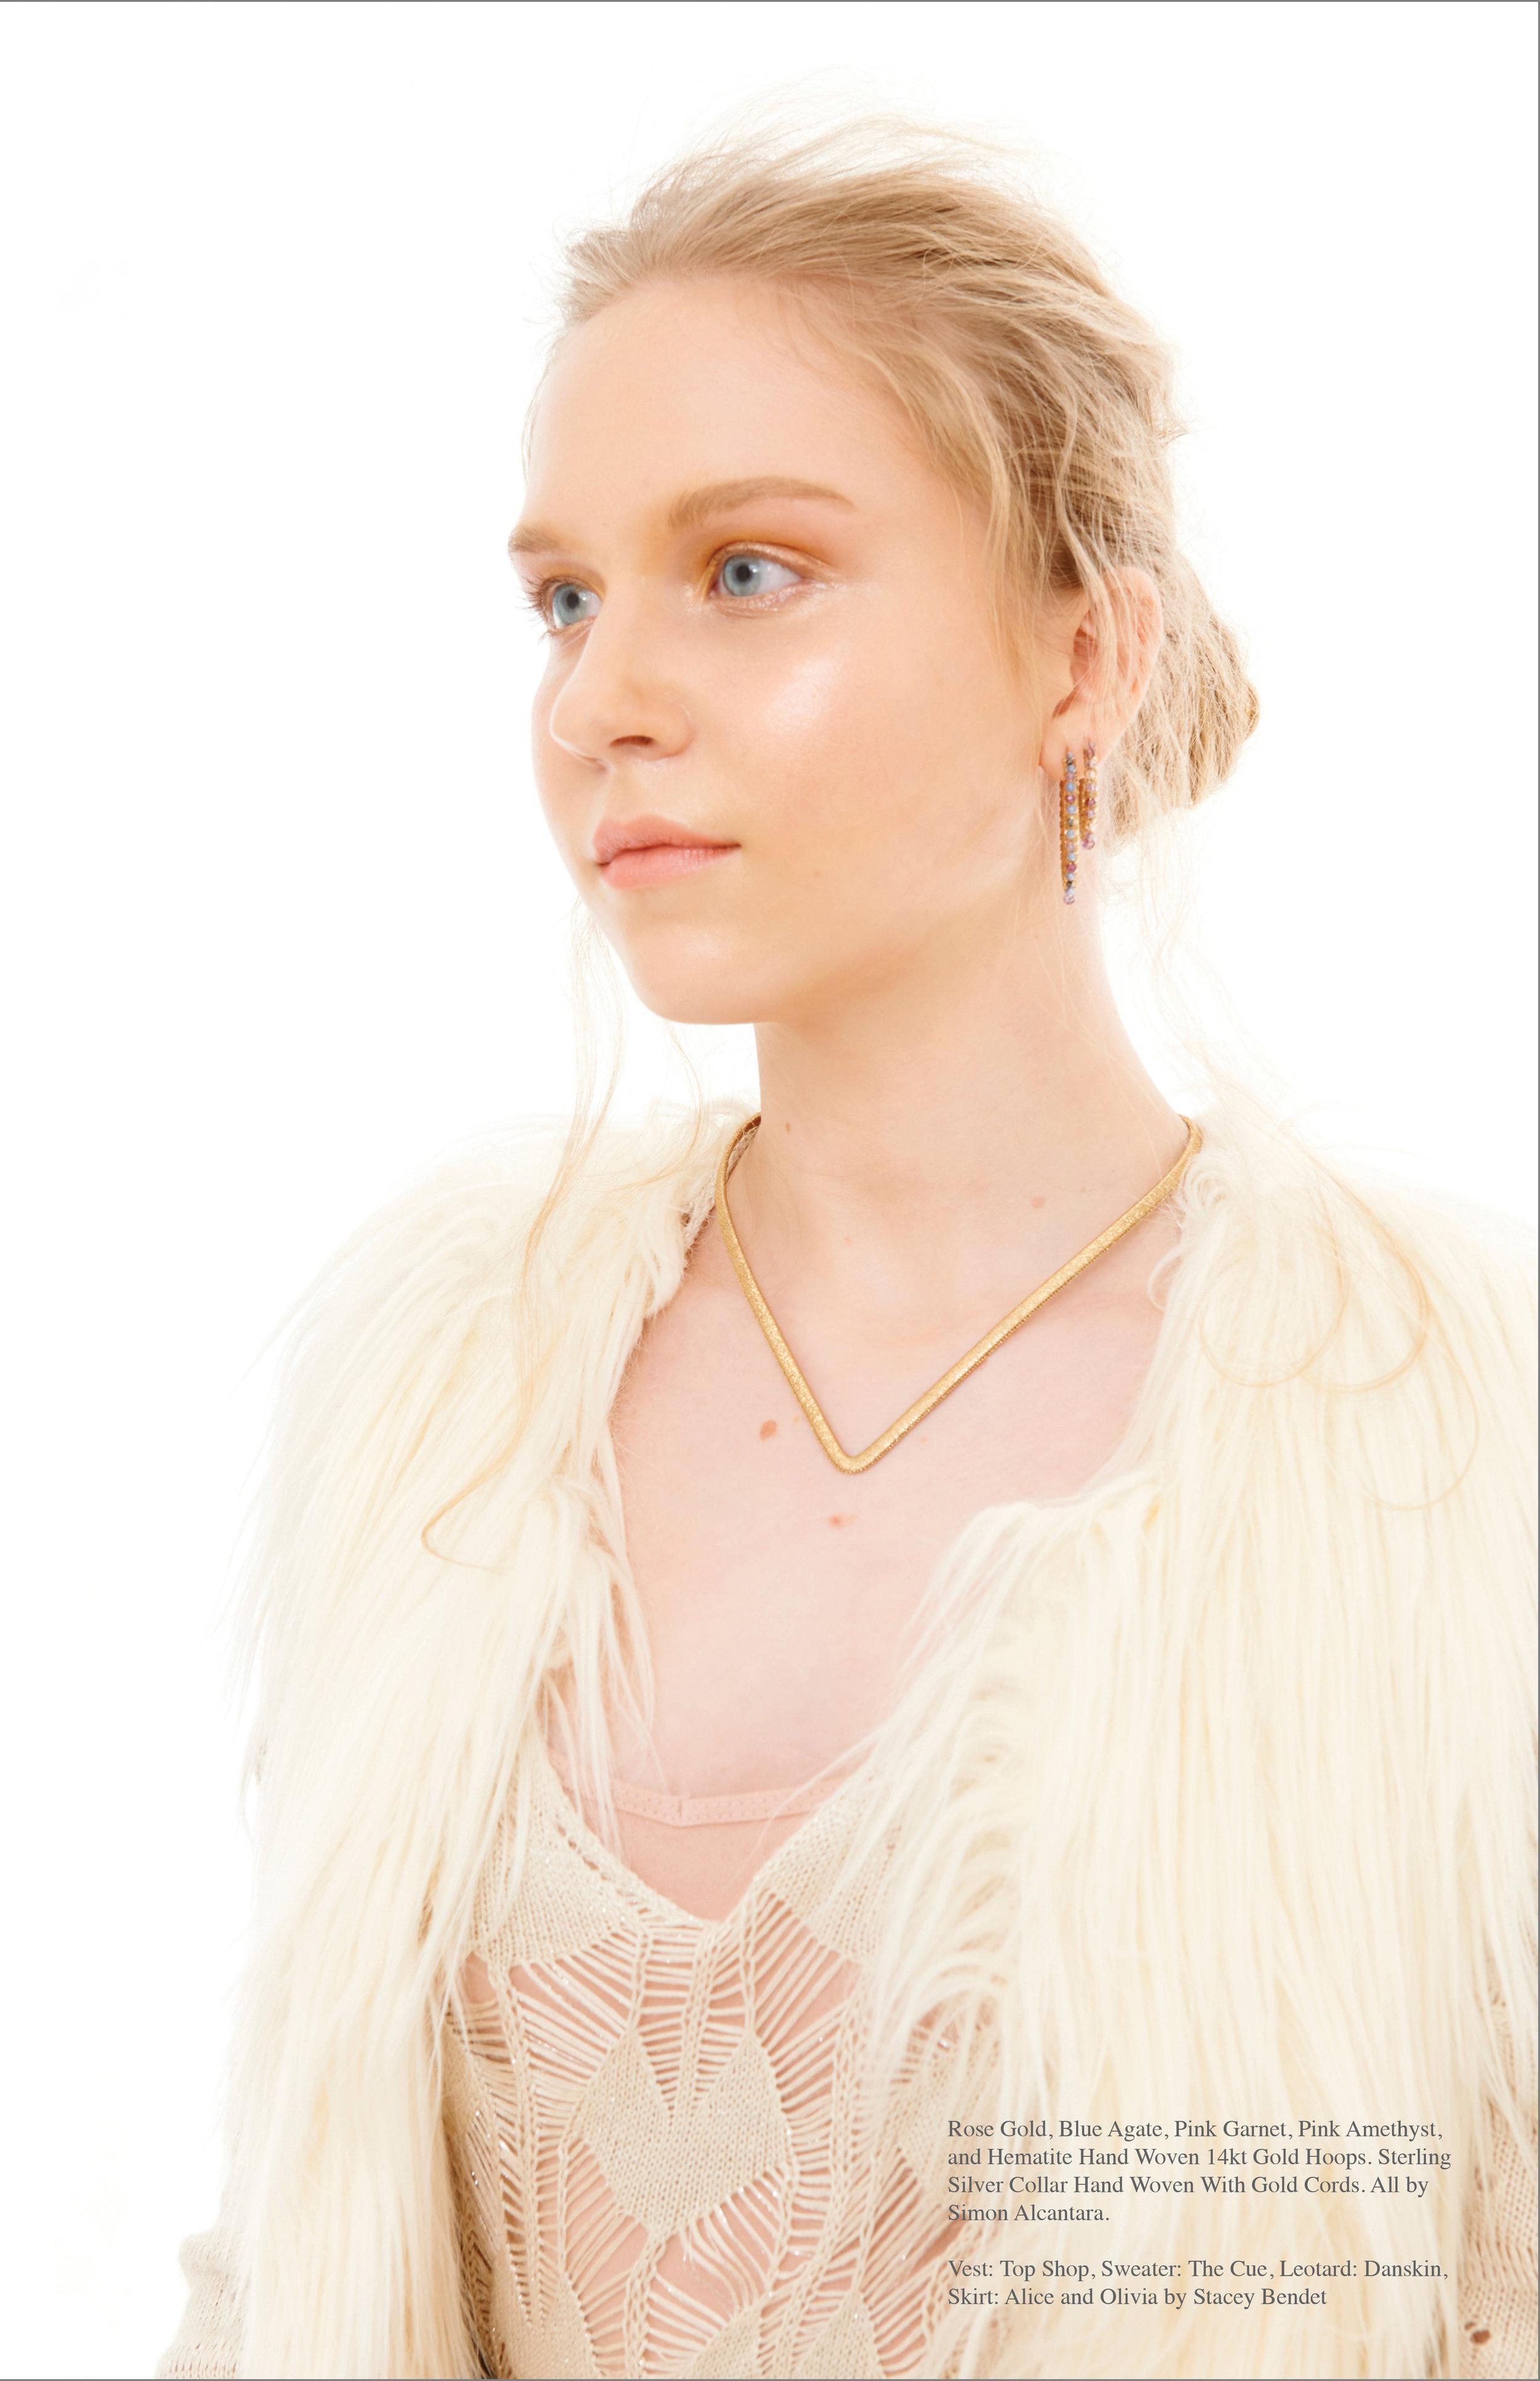 Photo: Ann Lee Campbell, Model Nan Venderbush, Makeup by Griselle Rosario